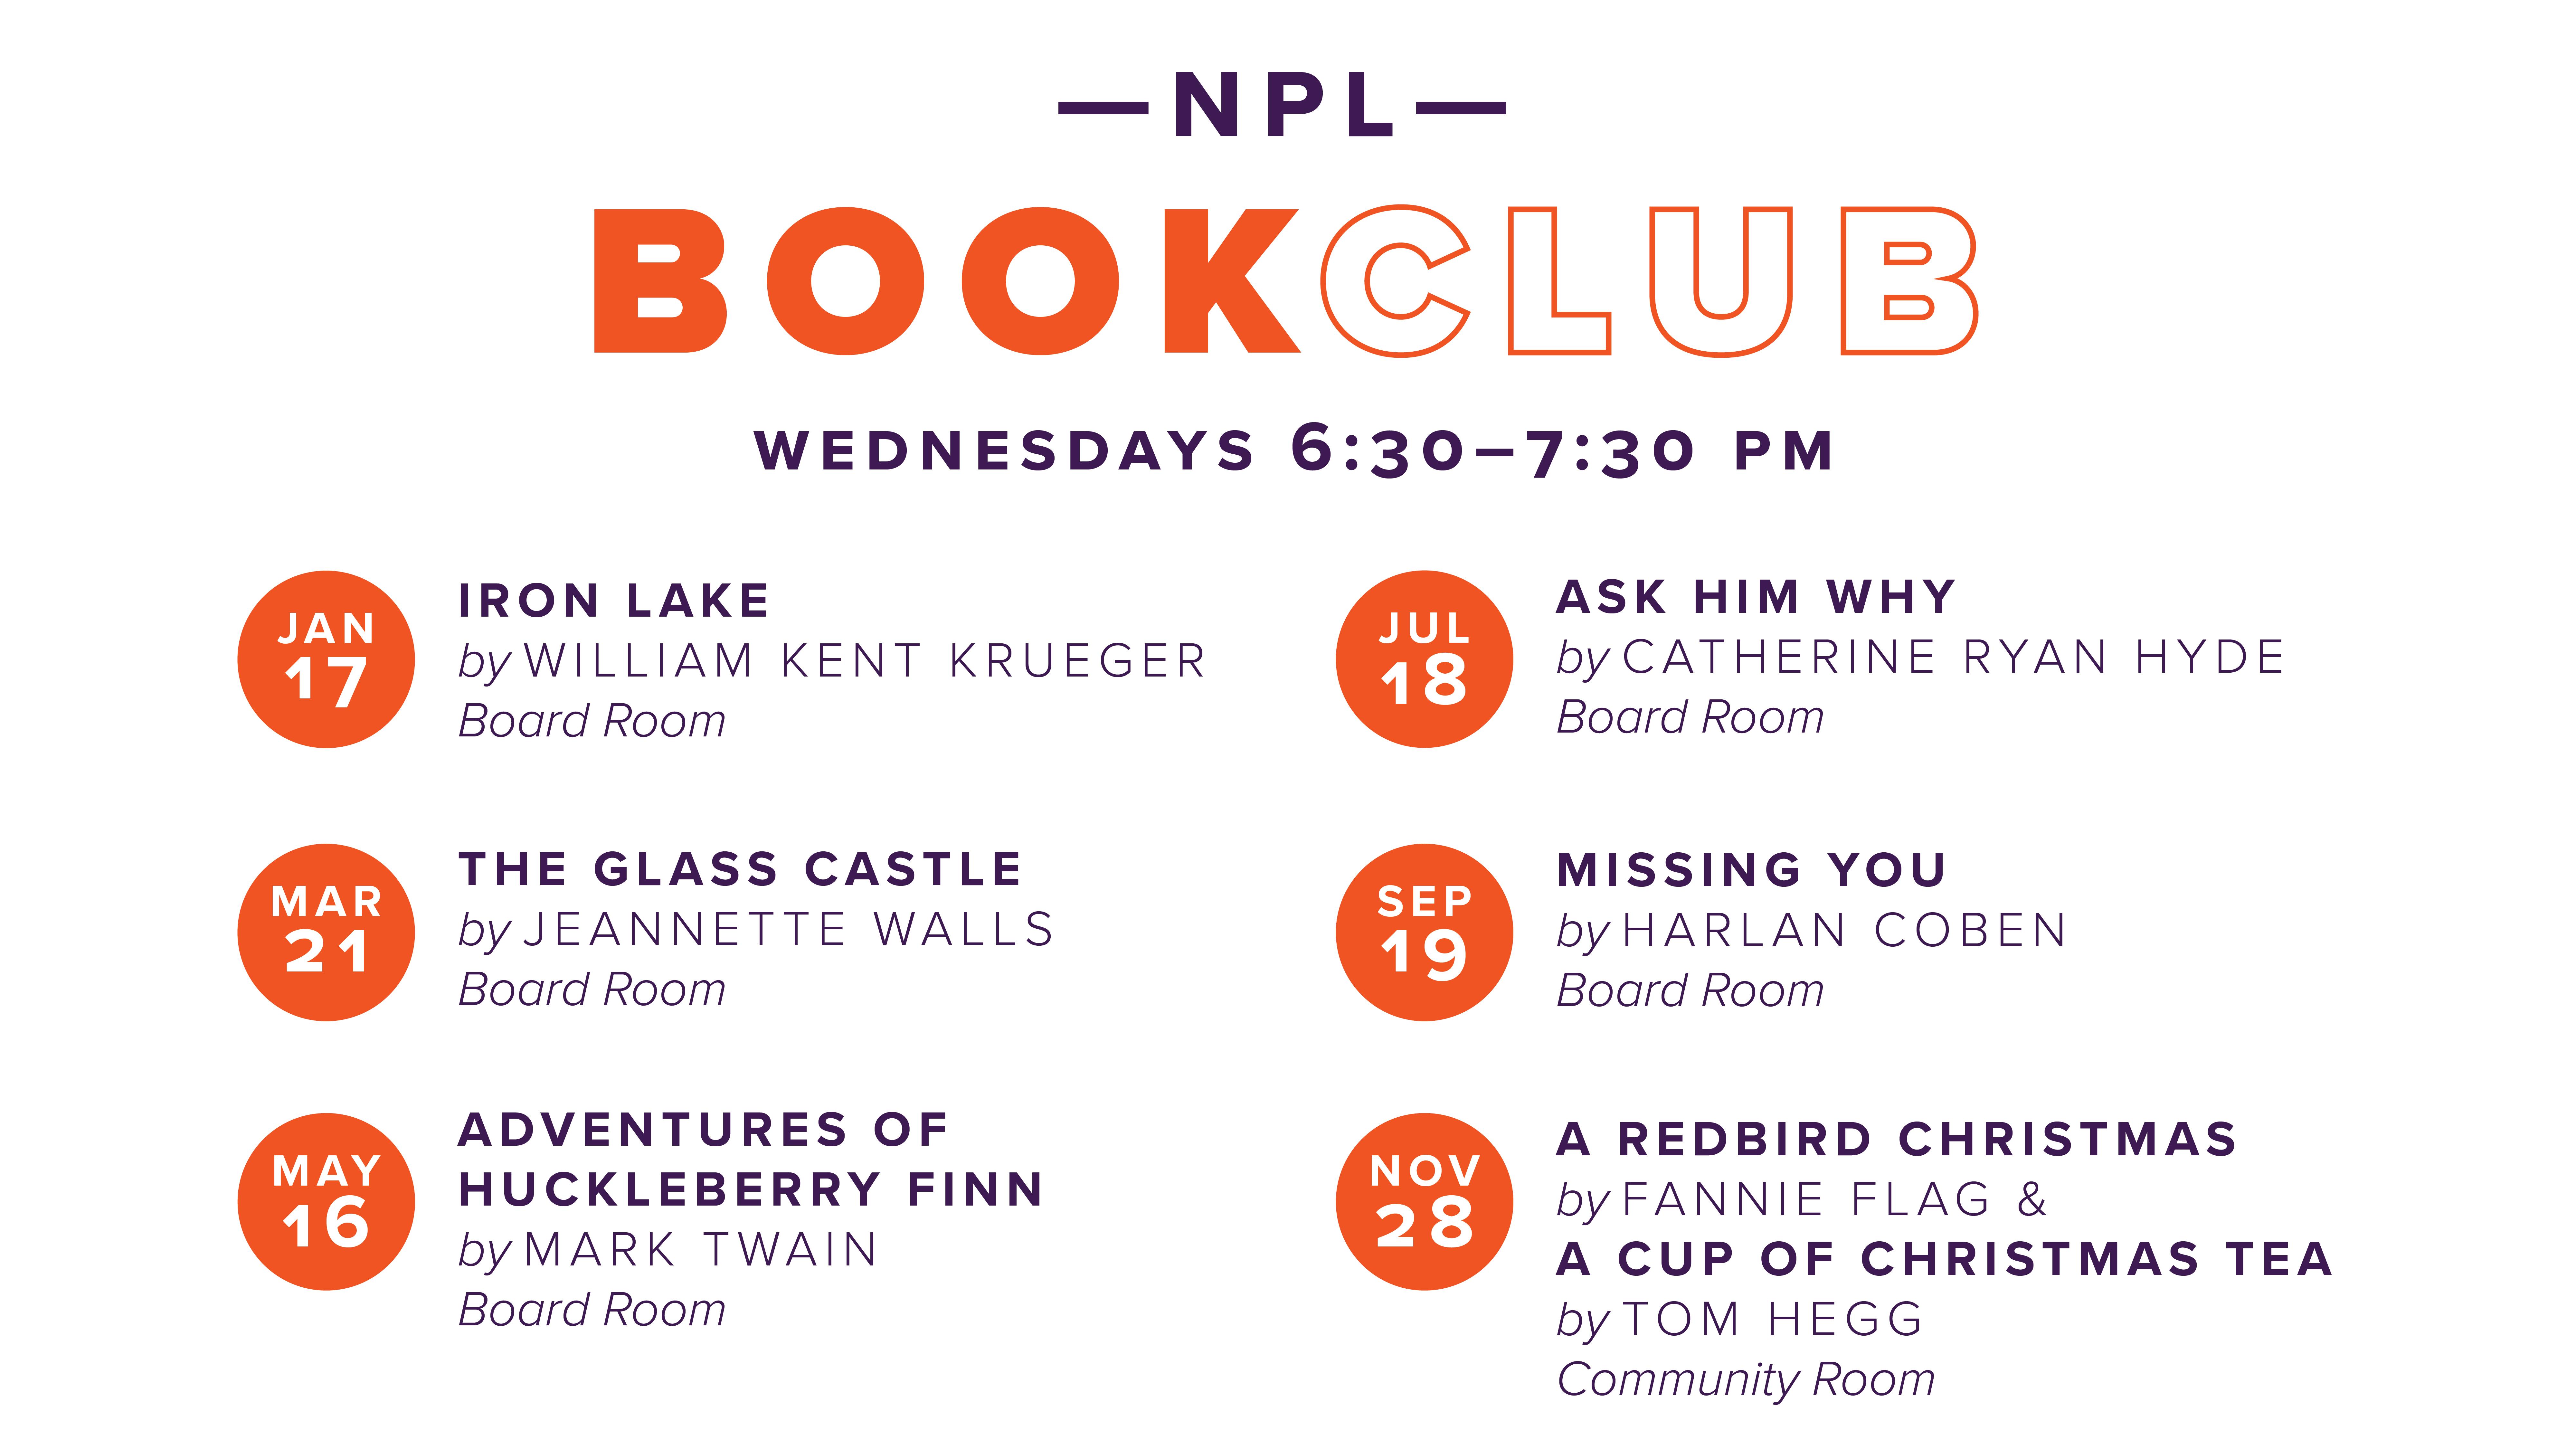 NPL Book Club